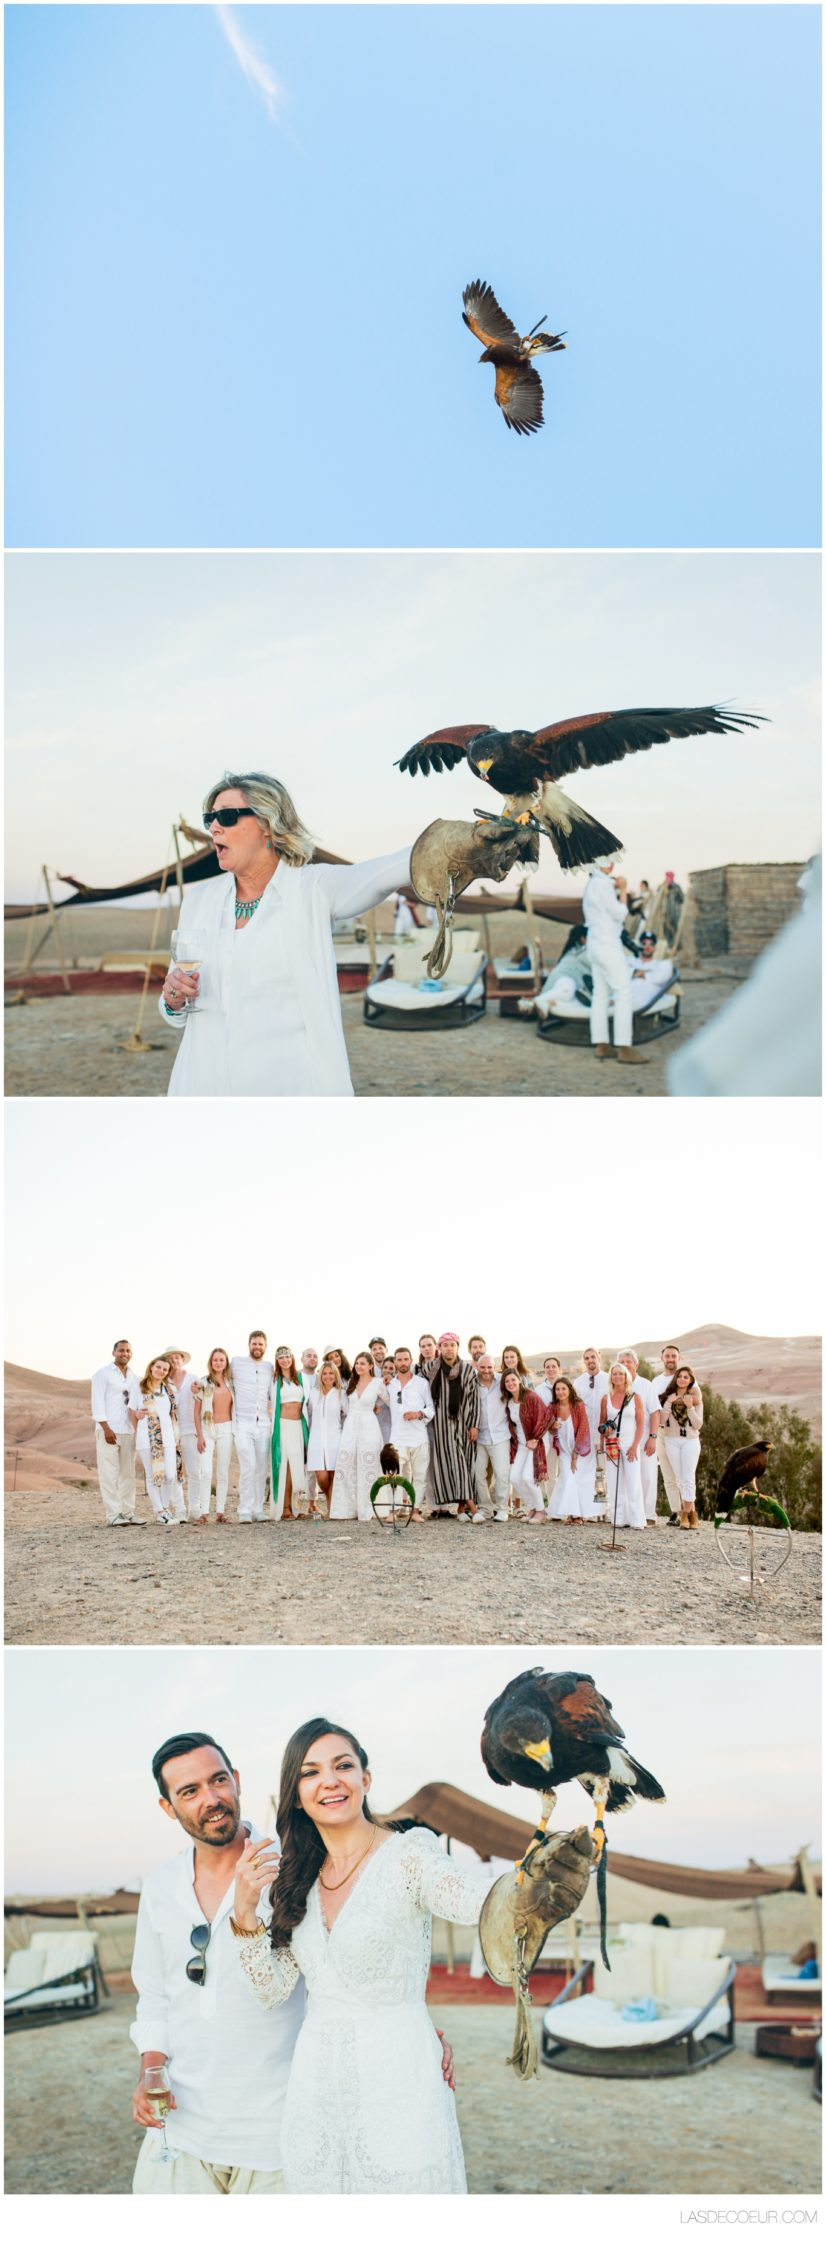 photographe mariage Marrakech buse harris